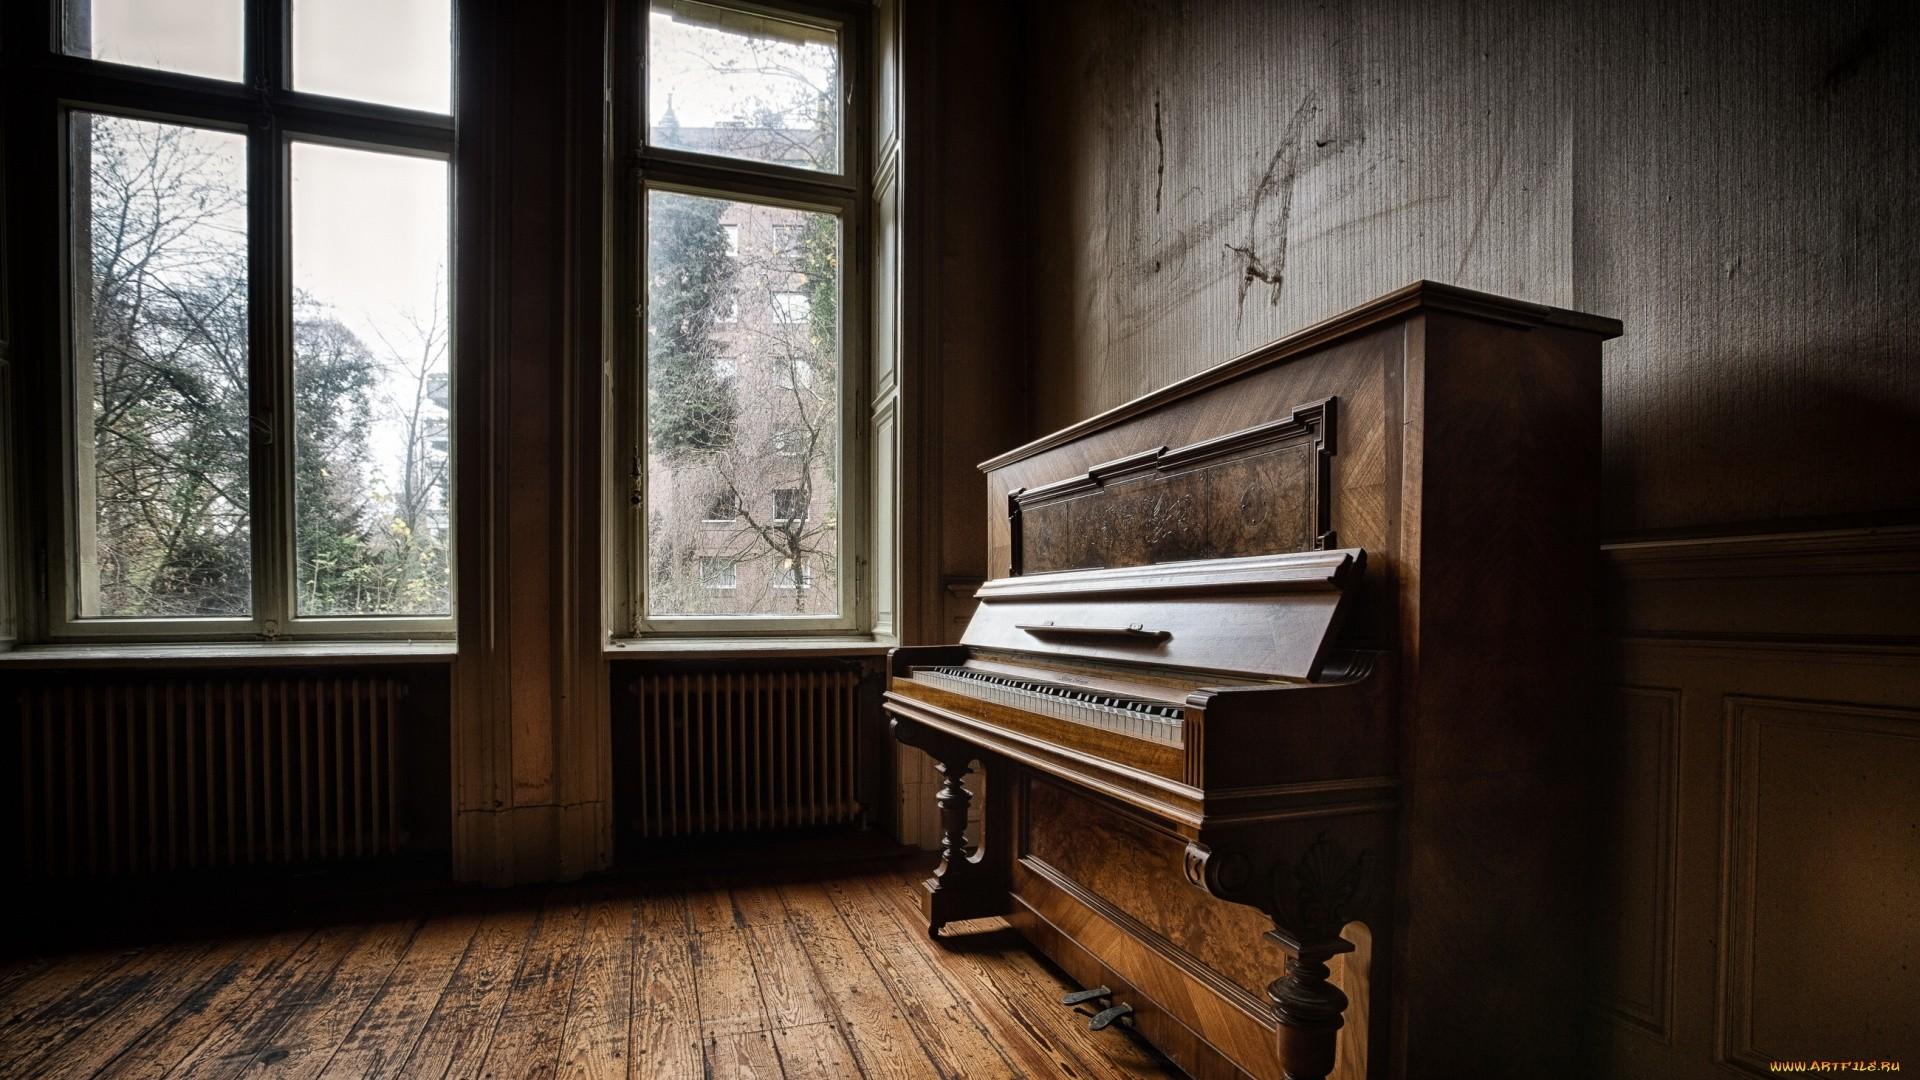 Piano Wallpaper theme